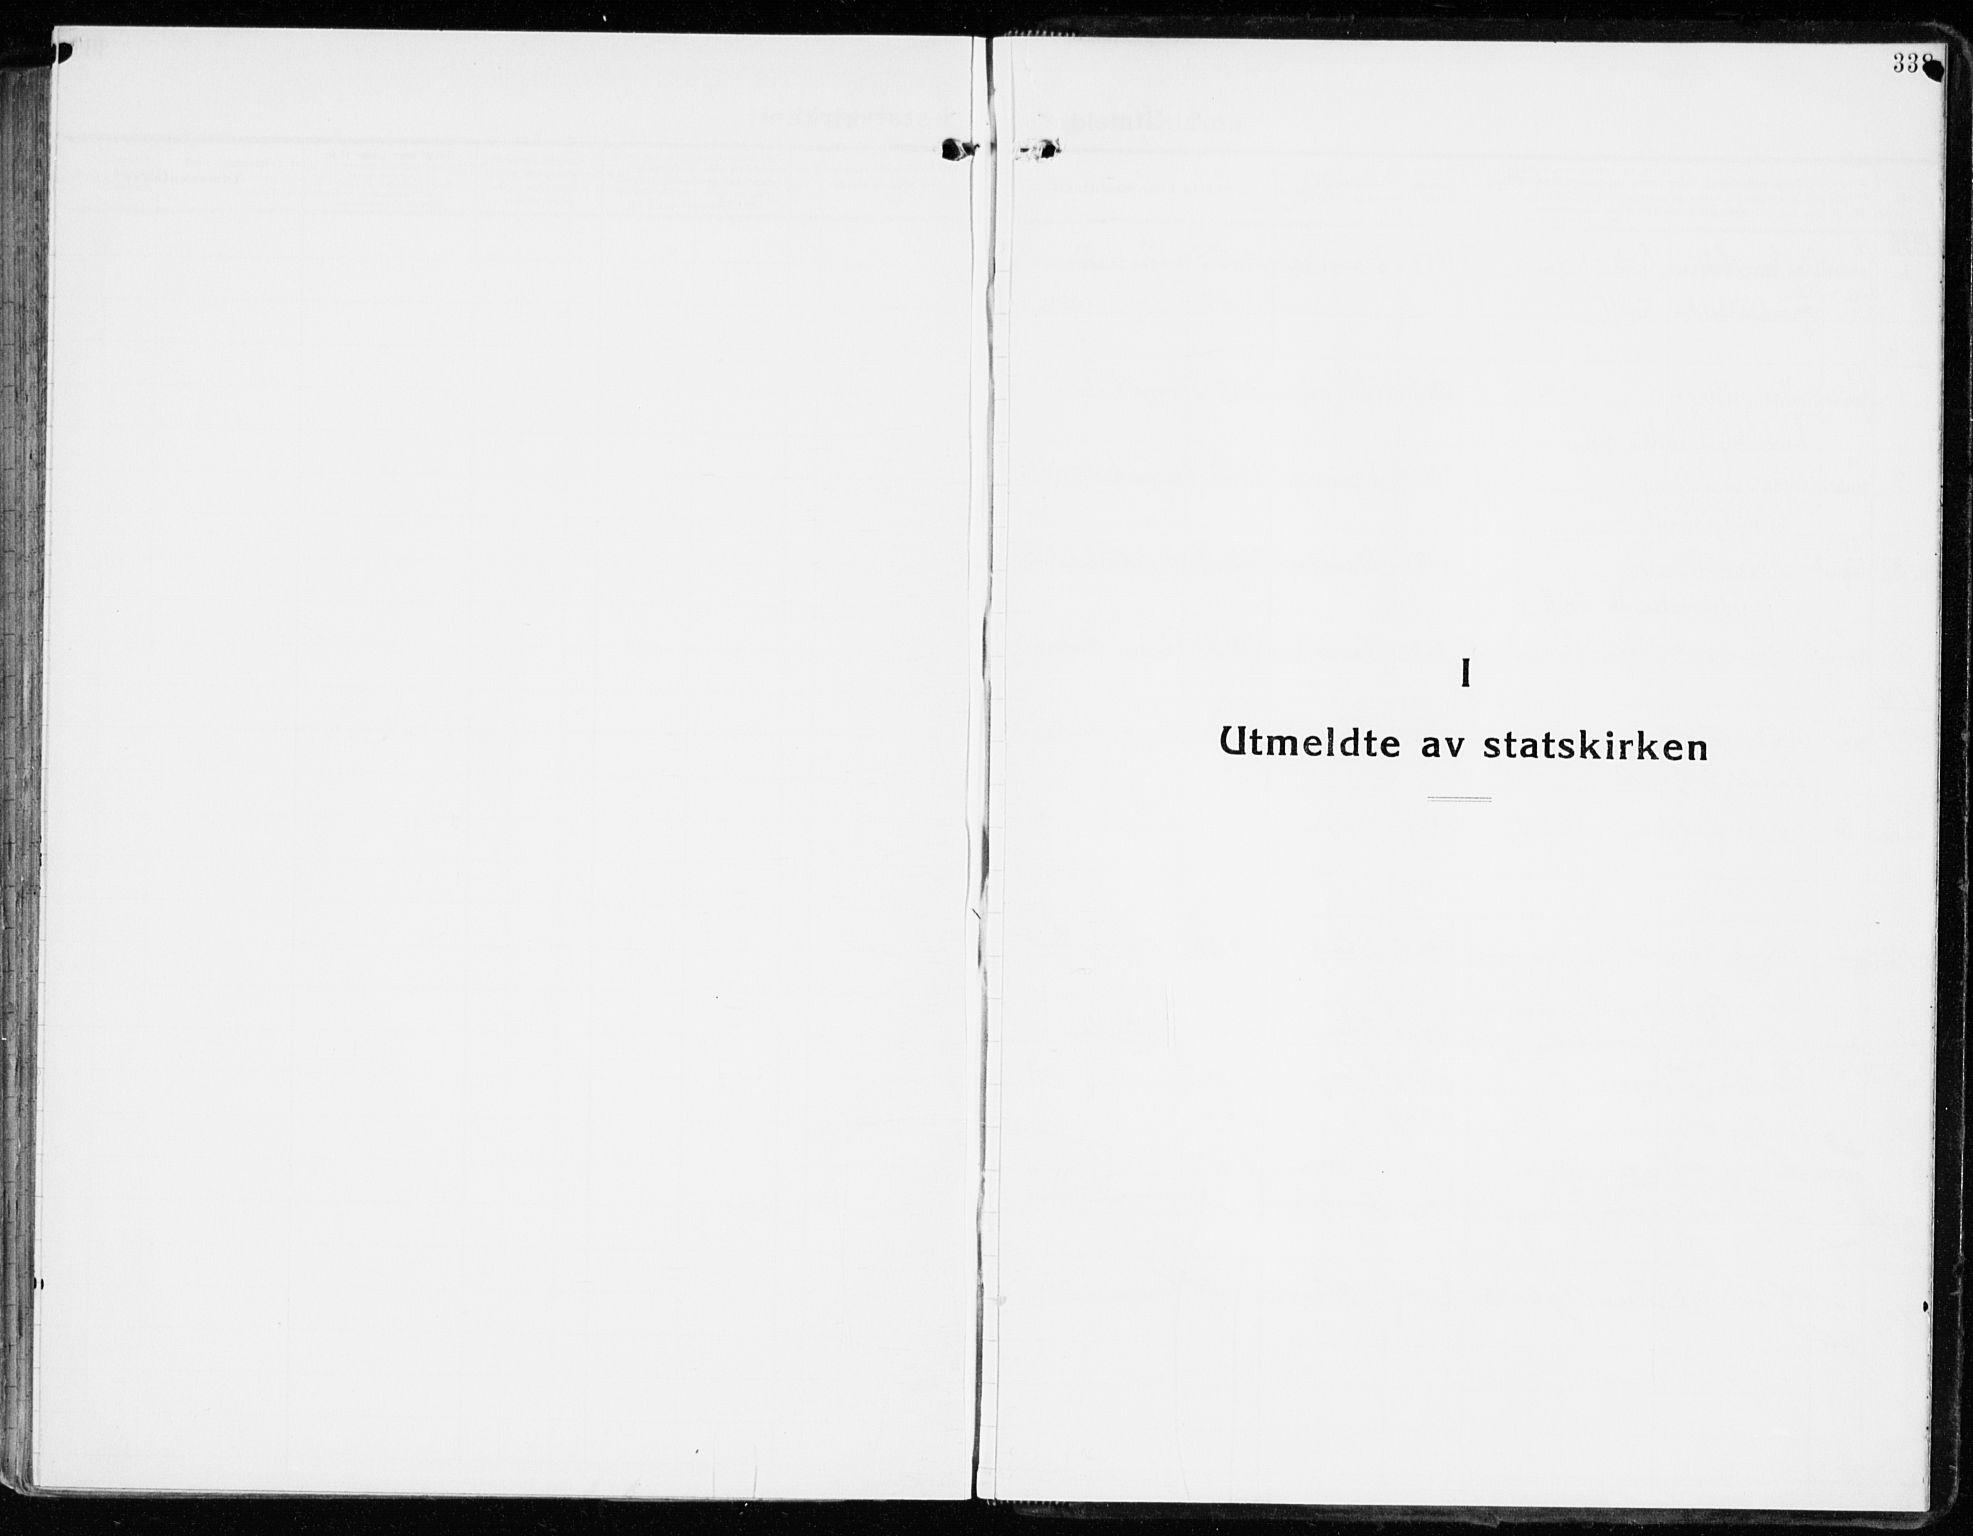 SAH, Stange prestekontor, K/L0027: Ministerialbok nr. 27, 1937-1947, s. 338